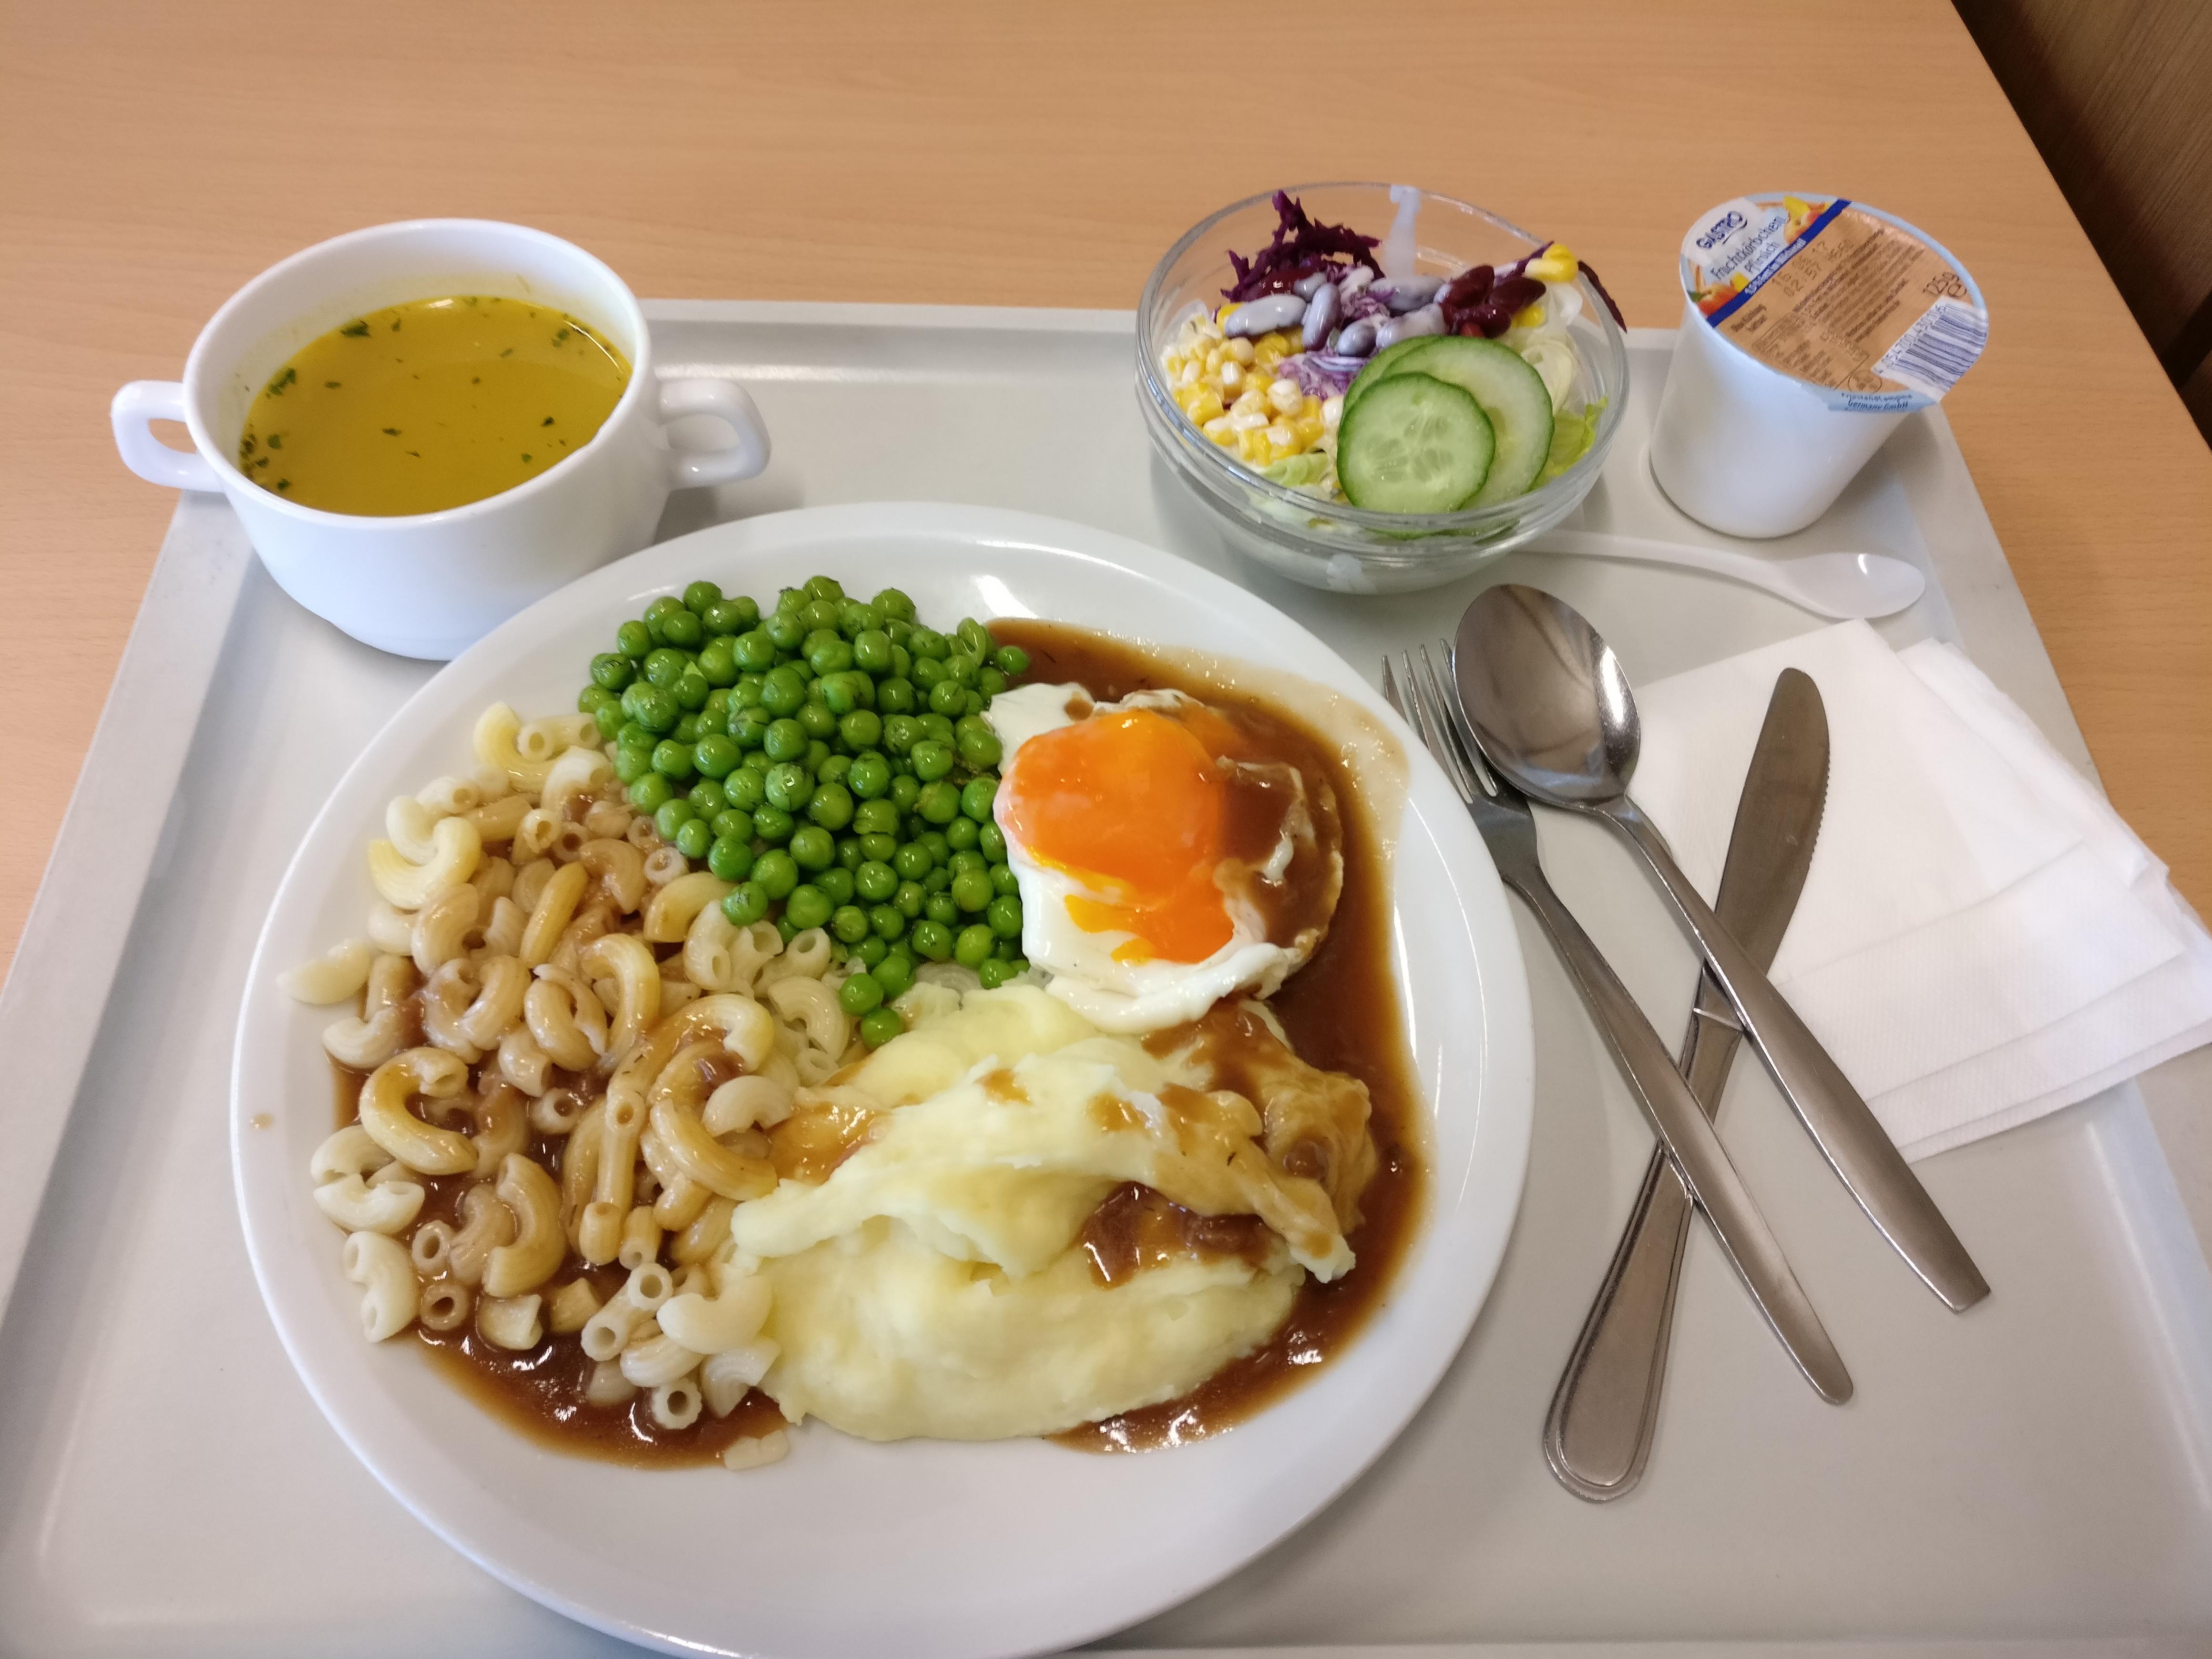 https://foodloader.net/nico_2017-05-16_spiegelei-erbsen-kartoffelpuree-nudeln-suppe-salat-joghurt.jpg